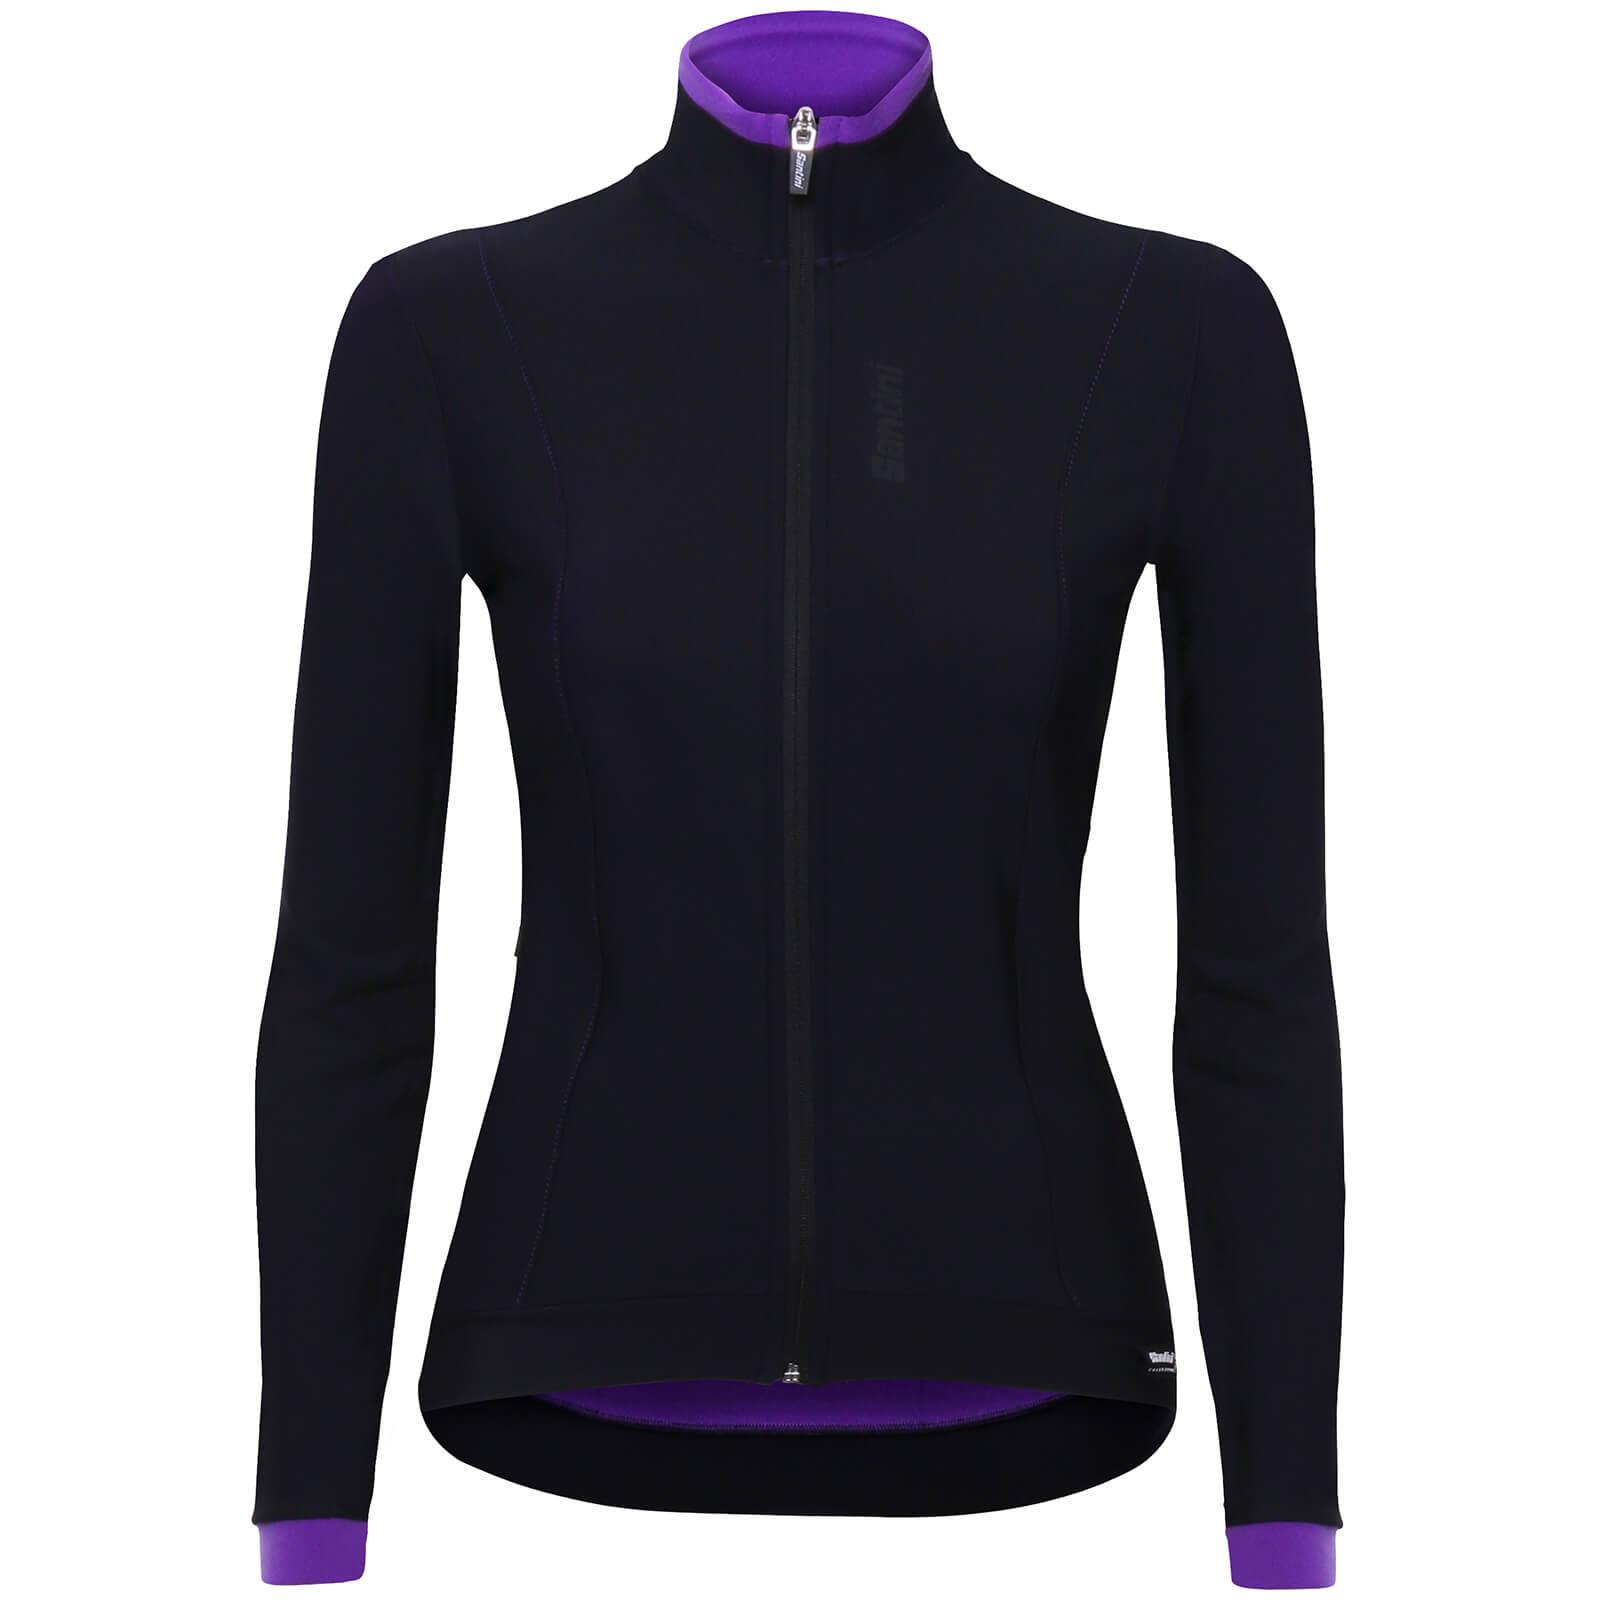 efd1e0ab8 Santini Women s Passo Long Sleeve Jersey - Violet